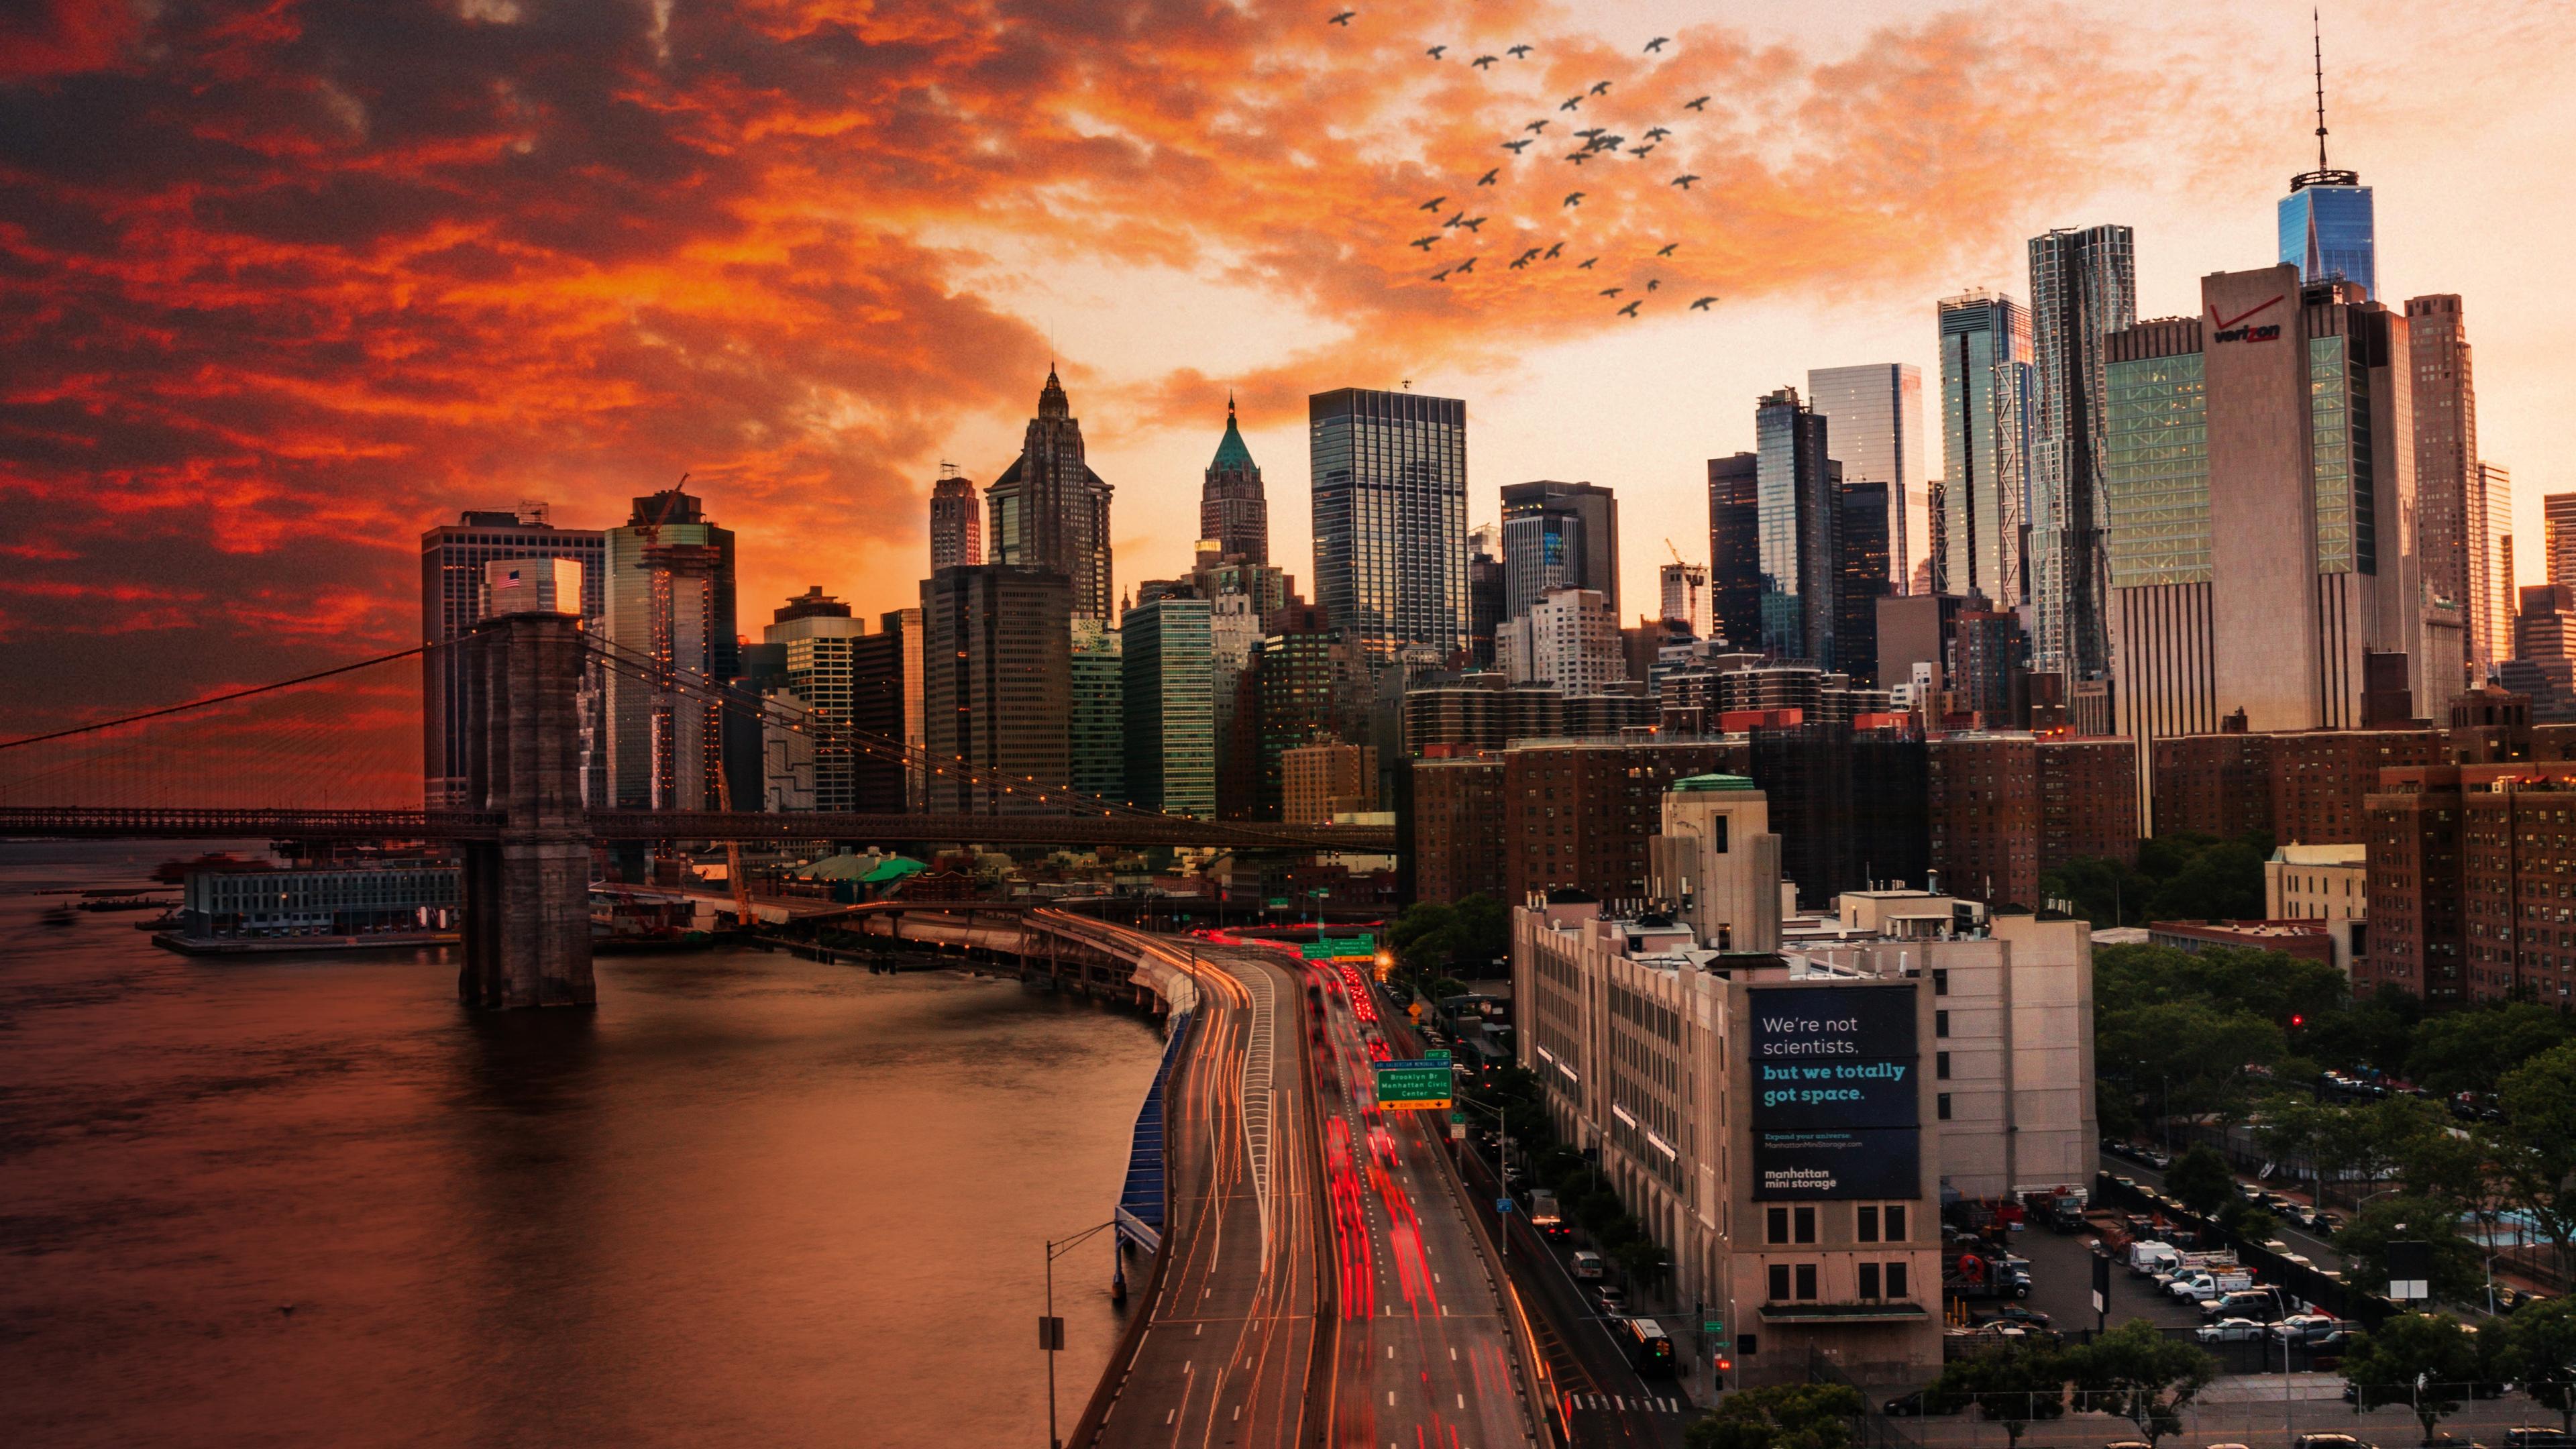 sunset over manhattan bridge 1569187795 - Sunset Over Manhattan Bridge - world wallpapers, new york wallpapers, manhattan wallpapers, hd-wallpapers, city wallpapers, 4k-wallpapers